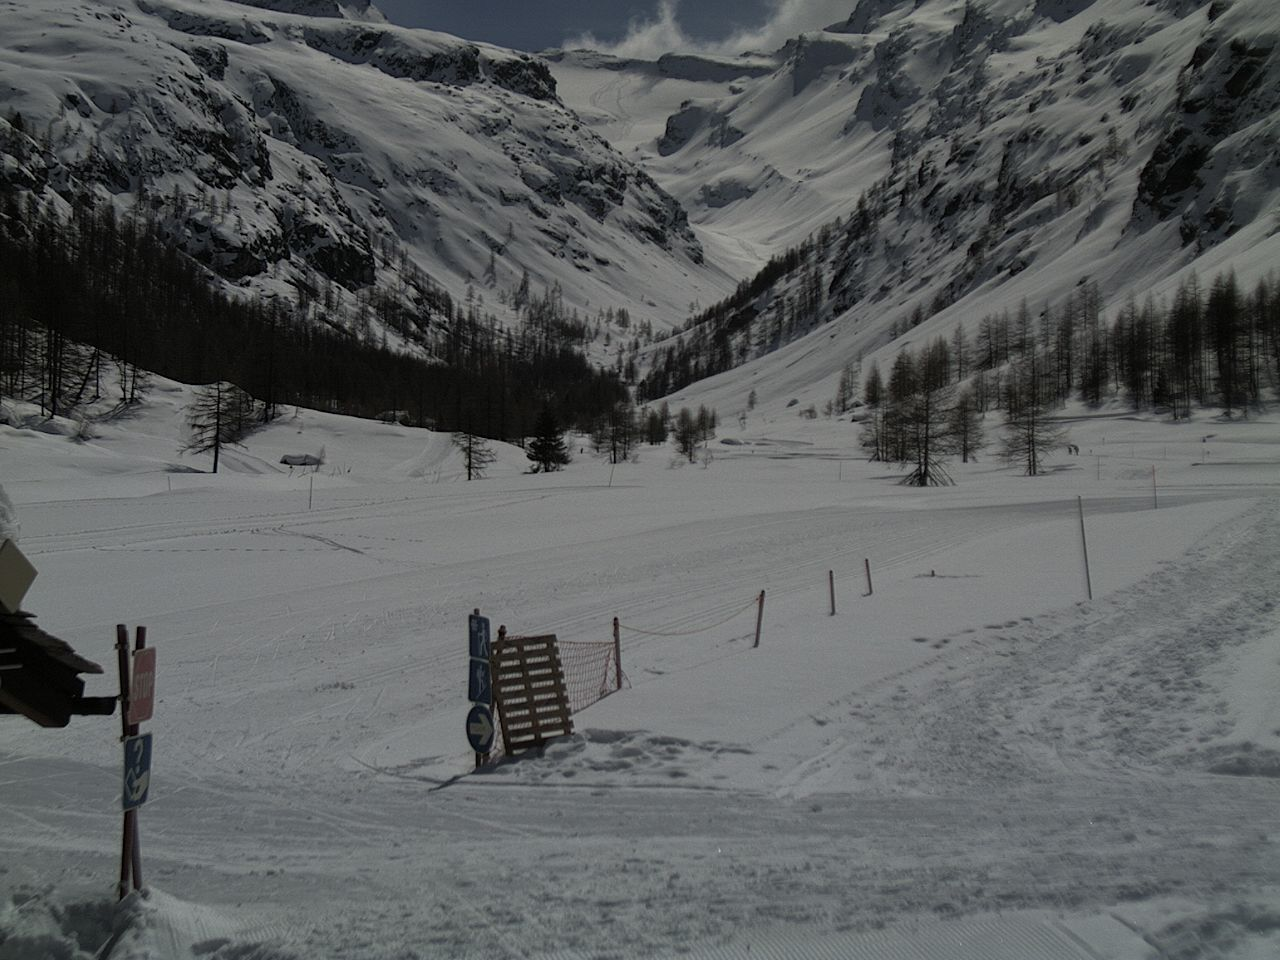 http://www.regione.vda.it/Bollettino_neve/images/valsa.jpg